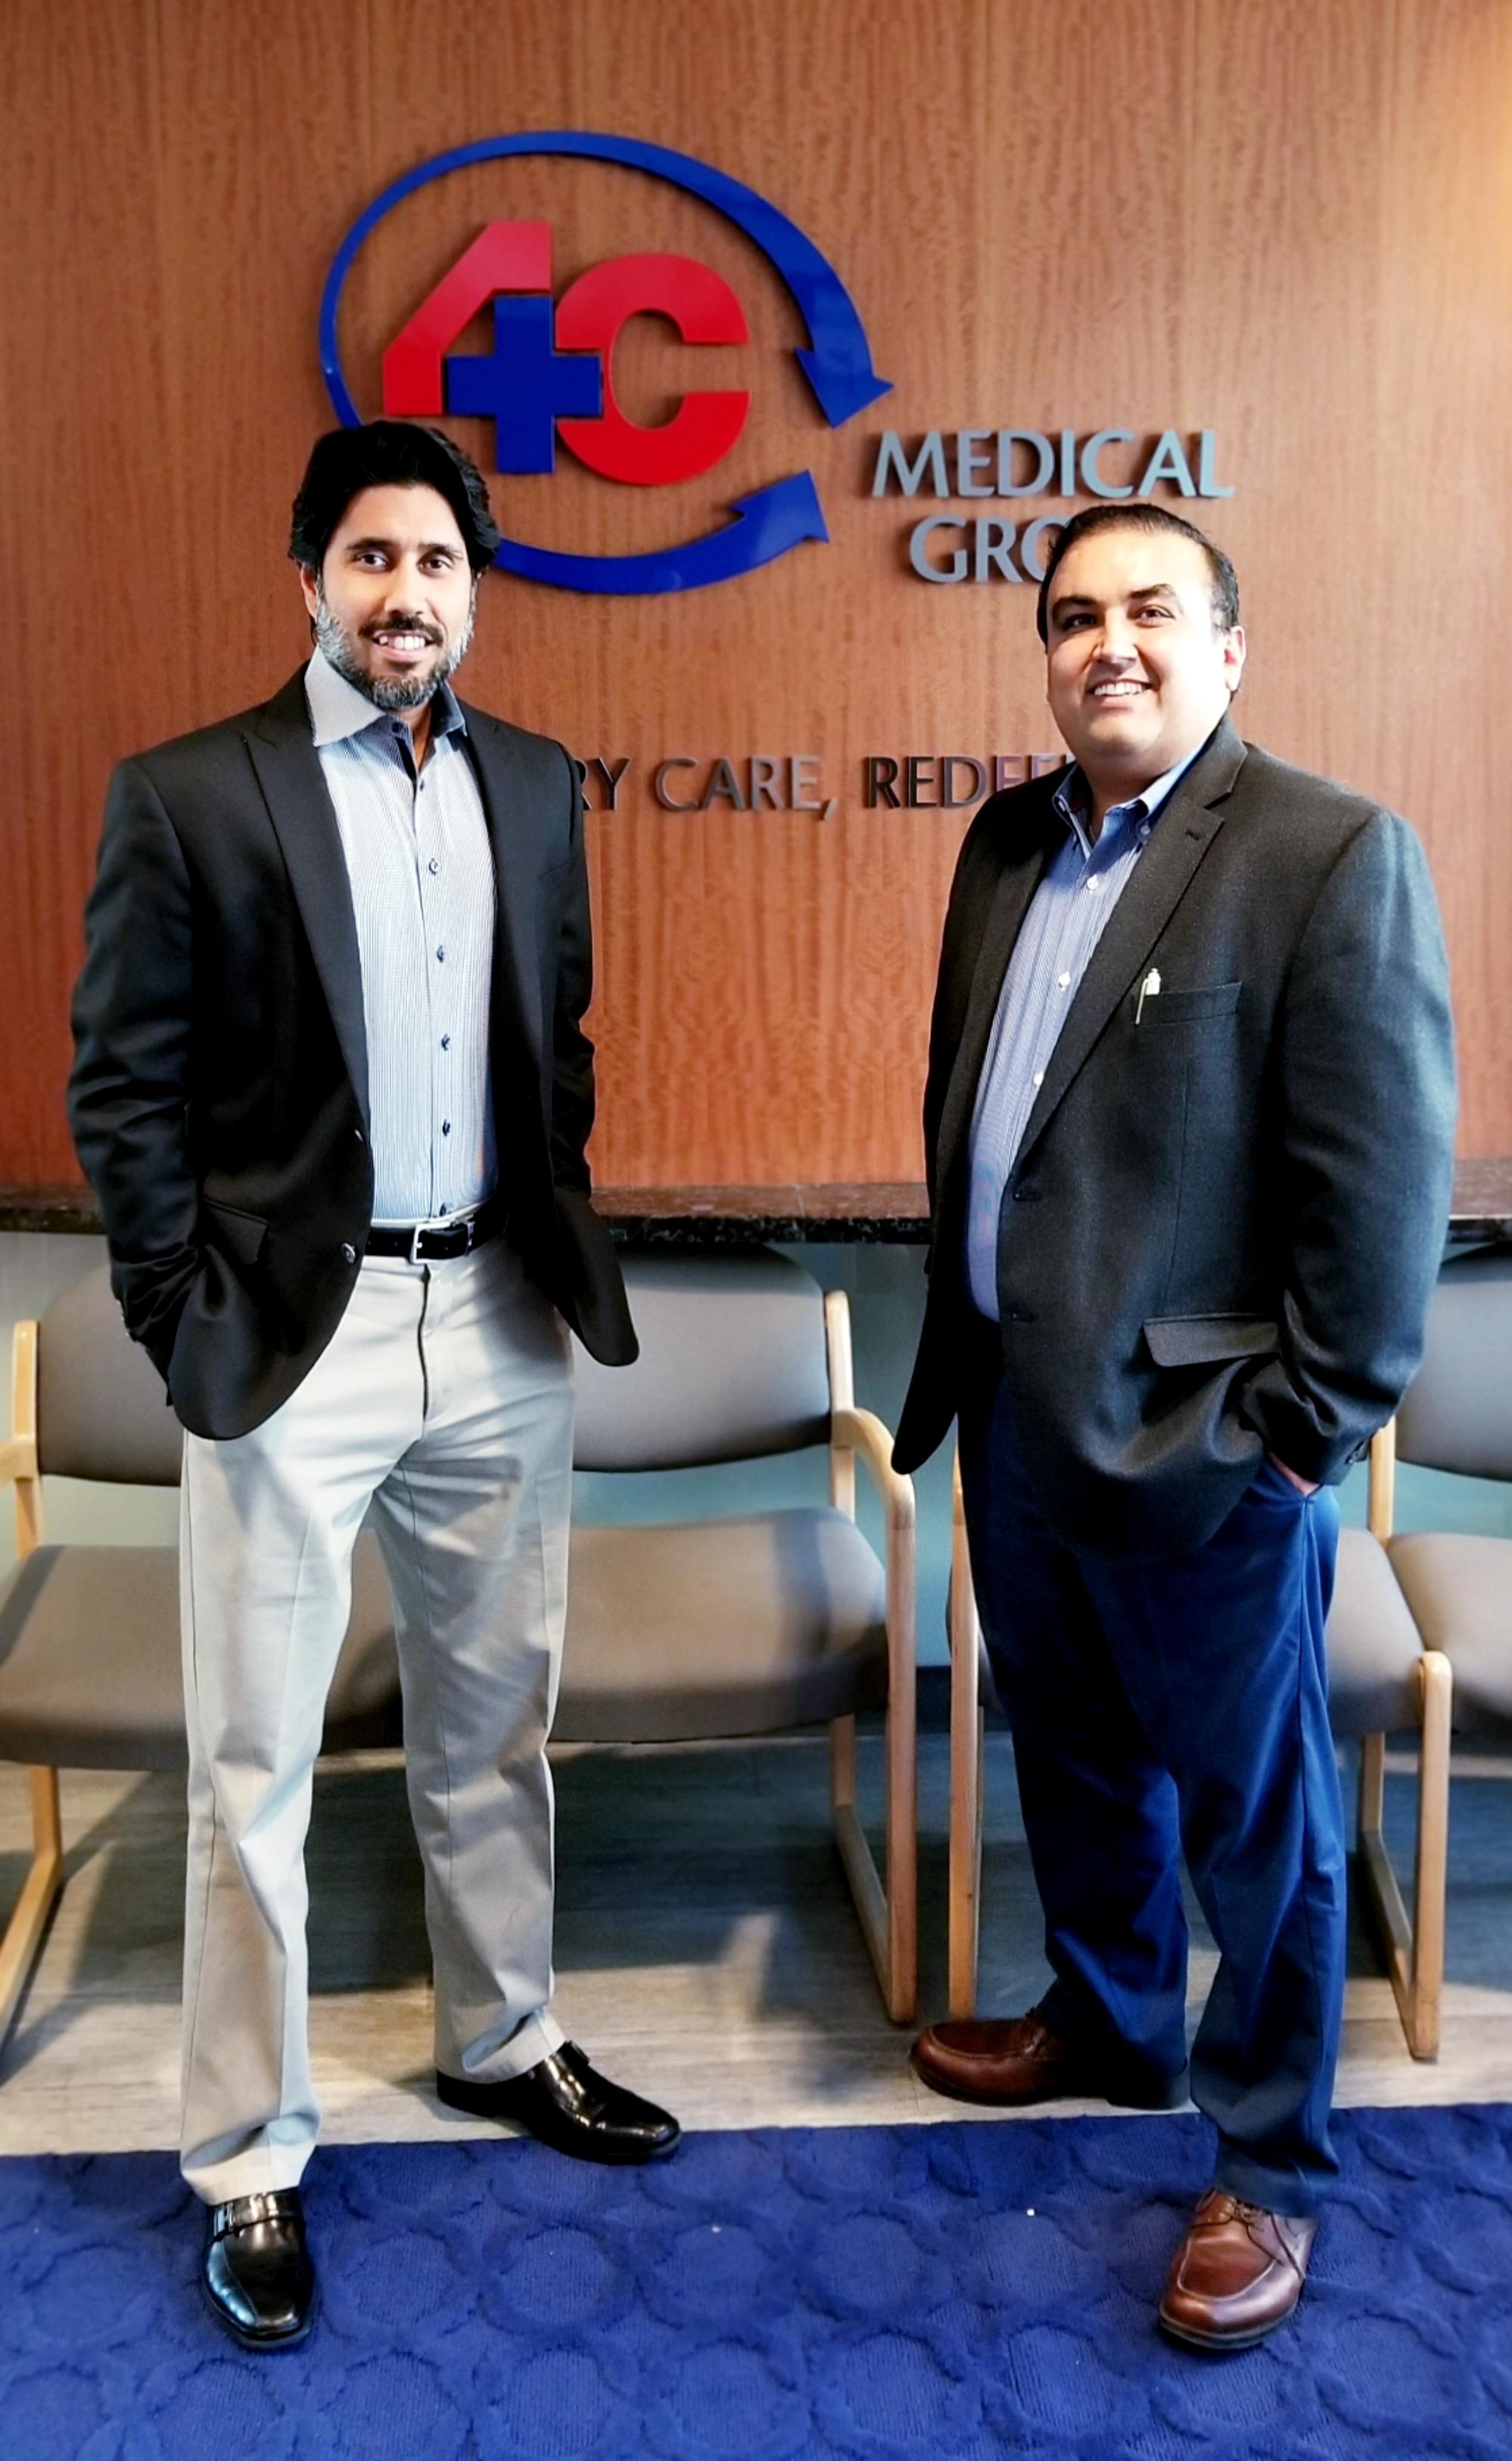 4C Medical Group's CEO Varesh Chaurasia and its Chief Medical Officer Dr Vishal Verma.jpg